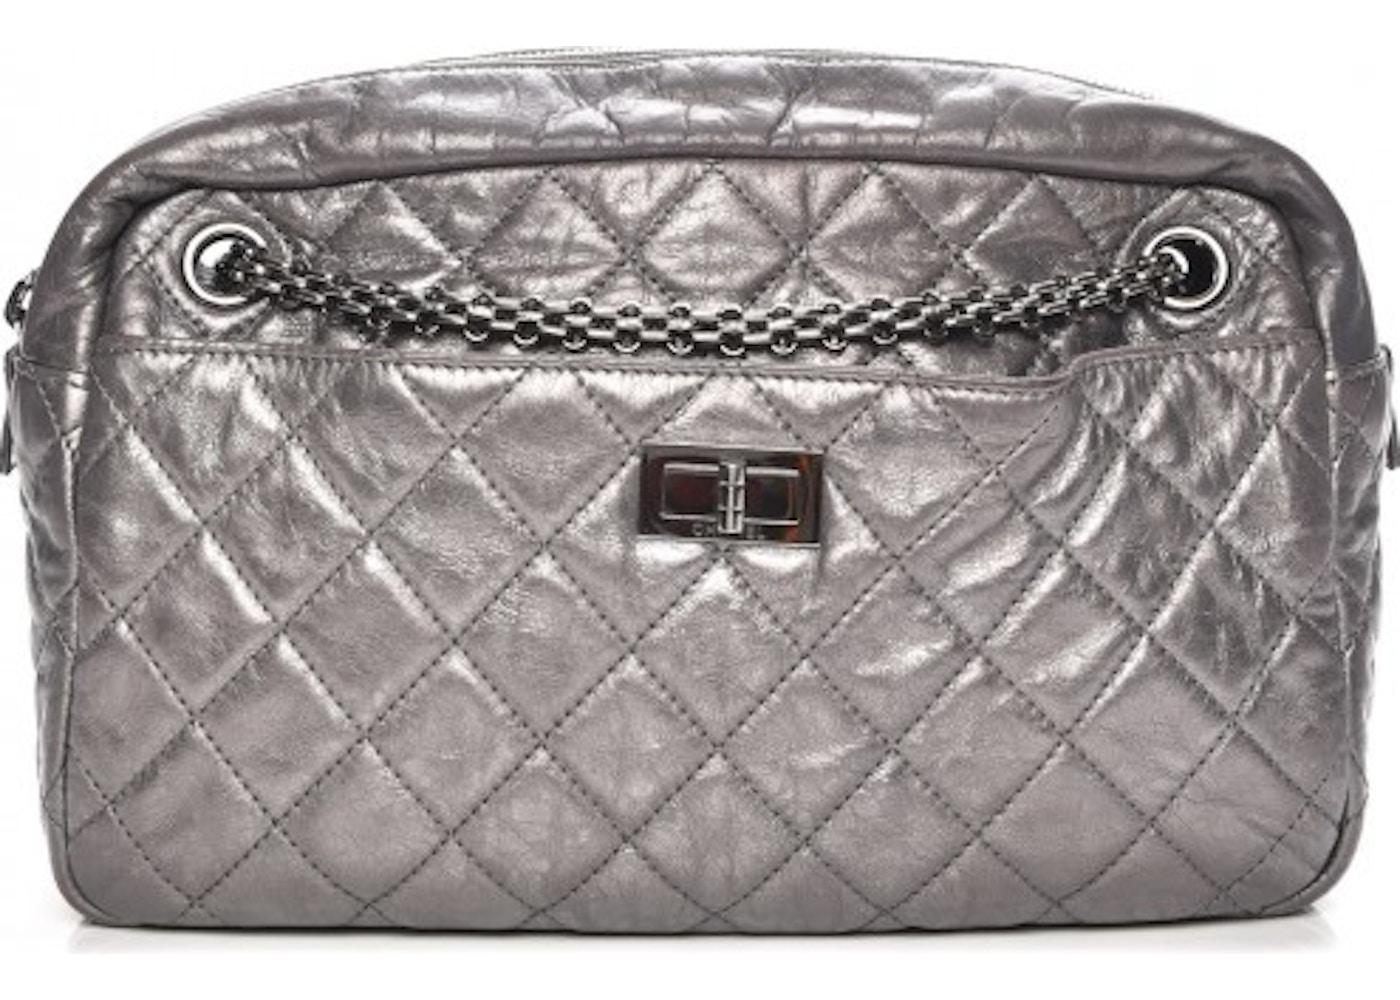 39675fbf3d59 Chanel Reissue Camera Case Quilted Diamond Metallic Medium Dark Silver.  Quilted Diamond Metallic Medium Dark Silver